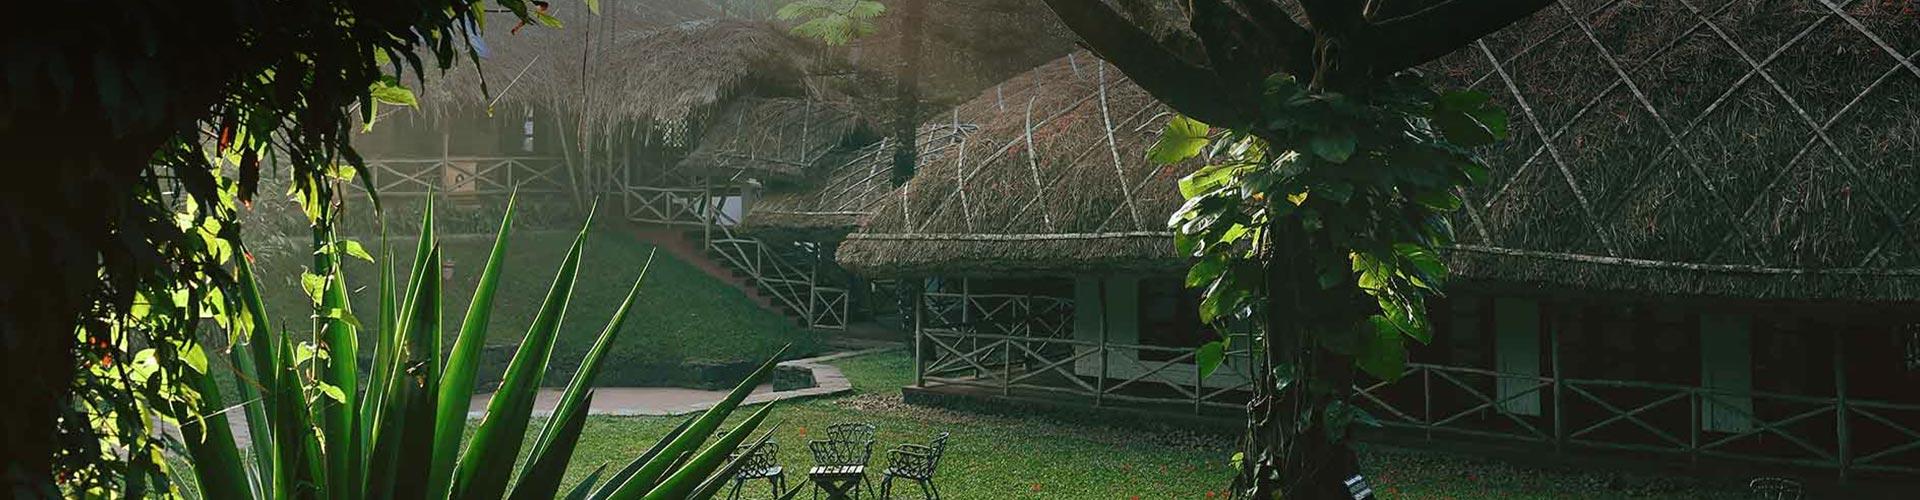 Spice Village – CGH Earth Resort